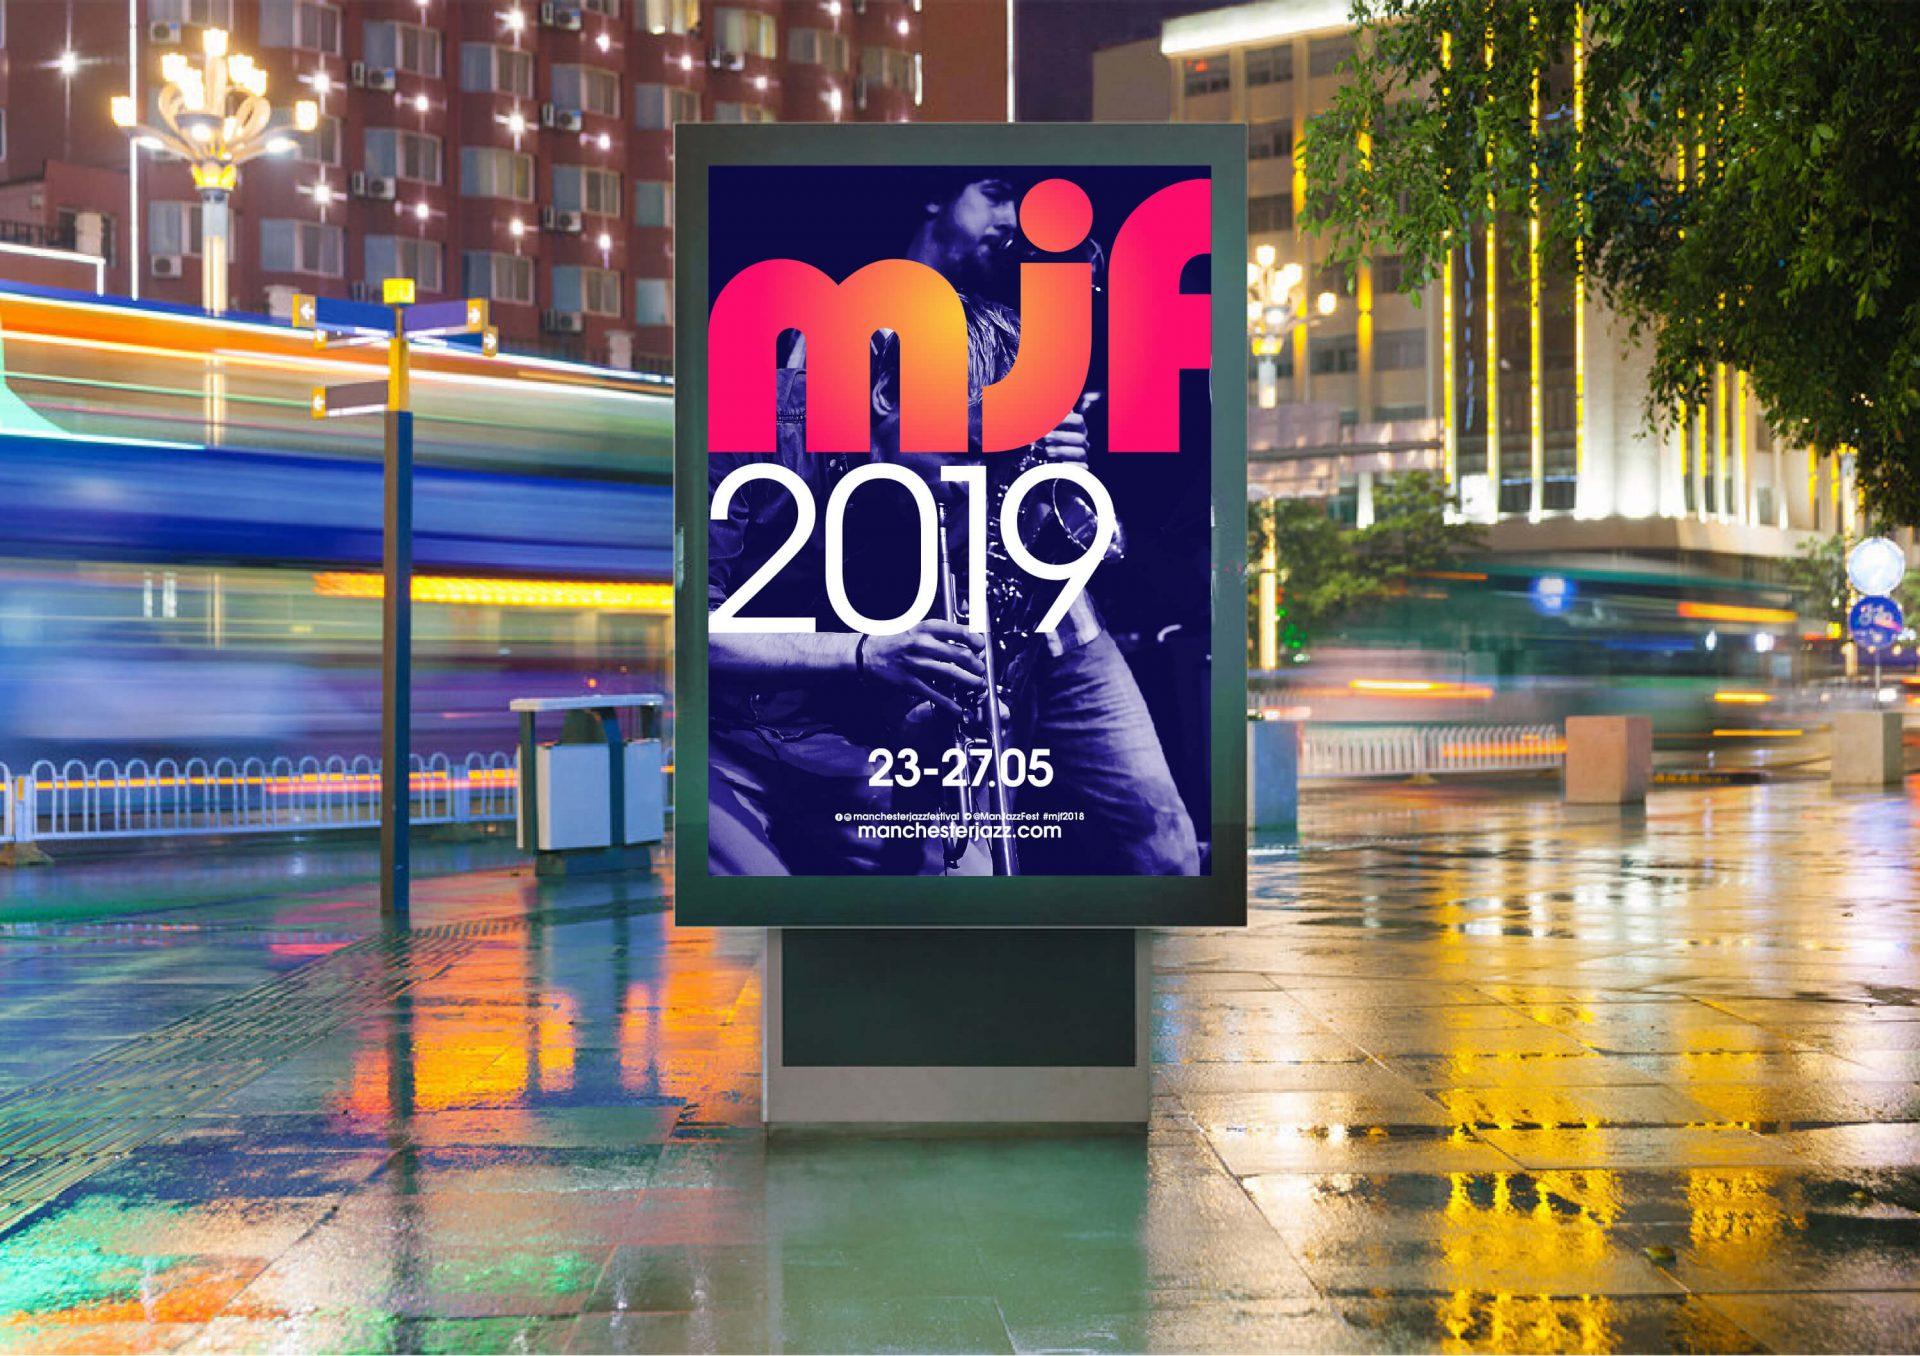 Manchester Jazz Festival image